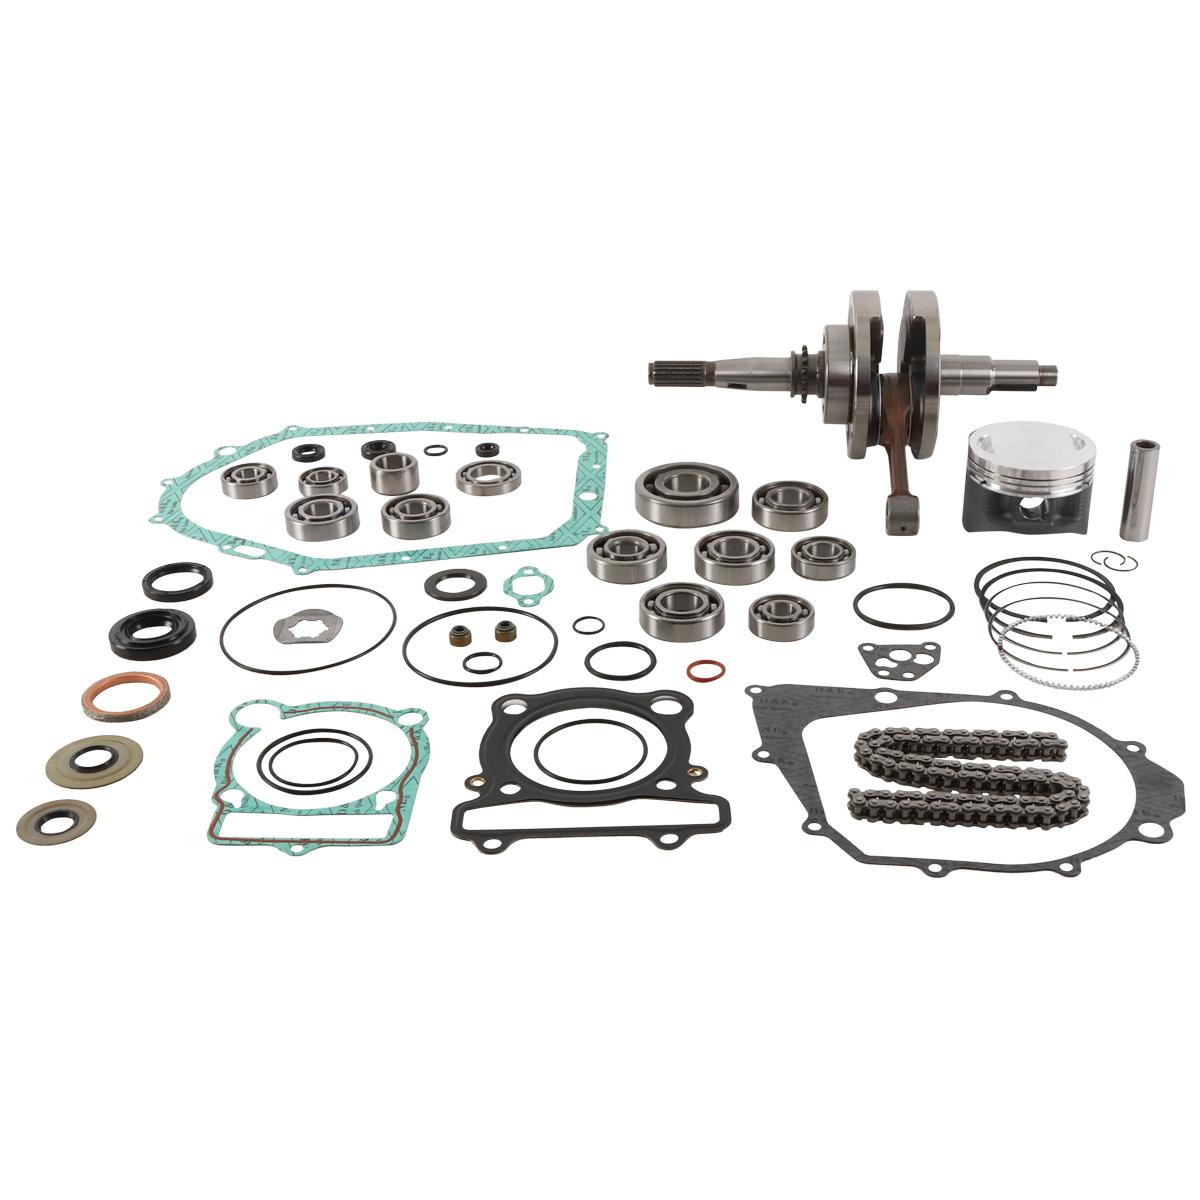 Complete Engine Rebuild Kits for Yamaha YFM 350 X Warrior